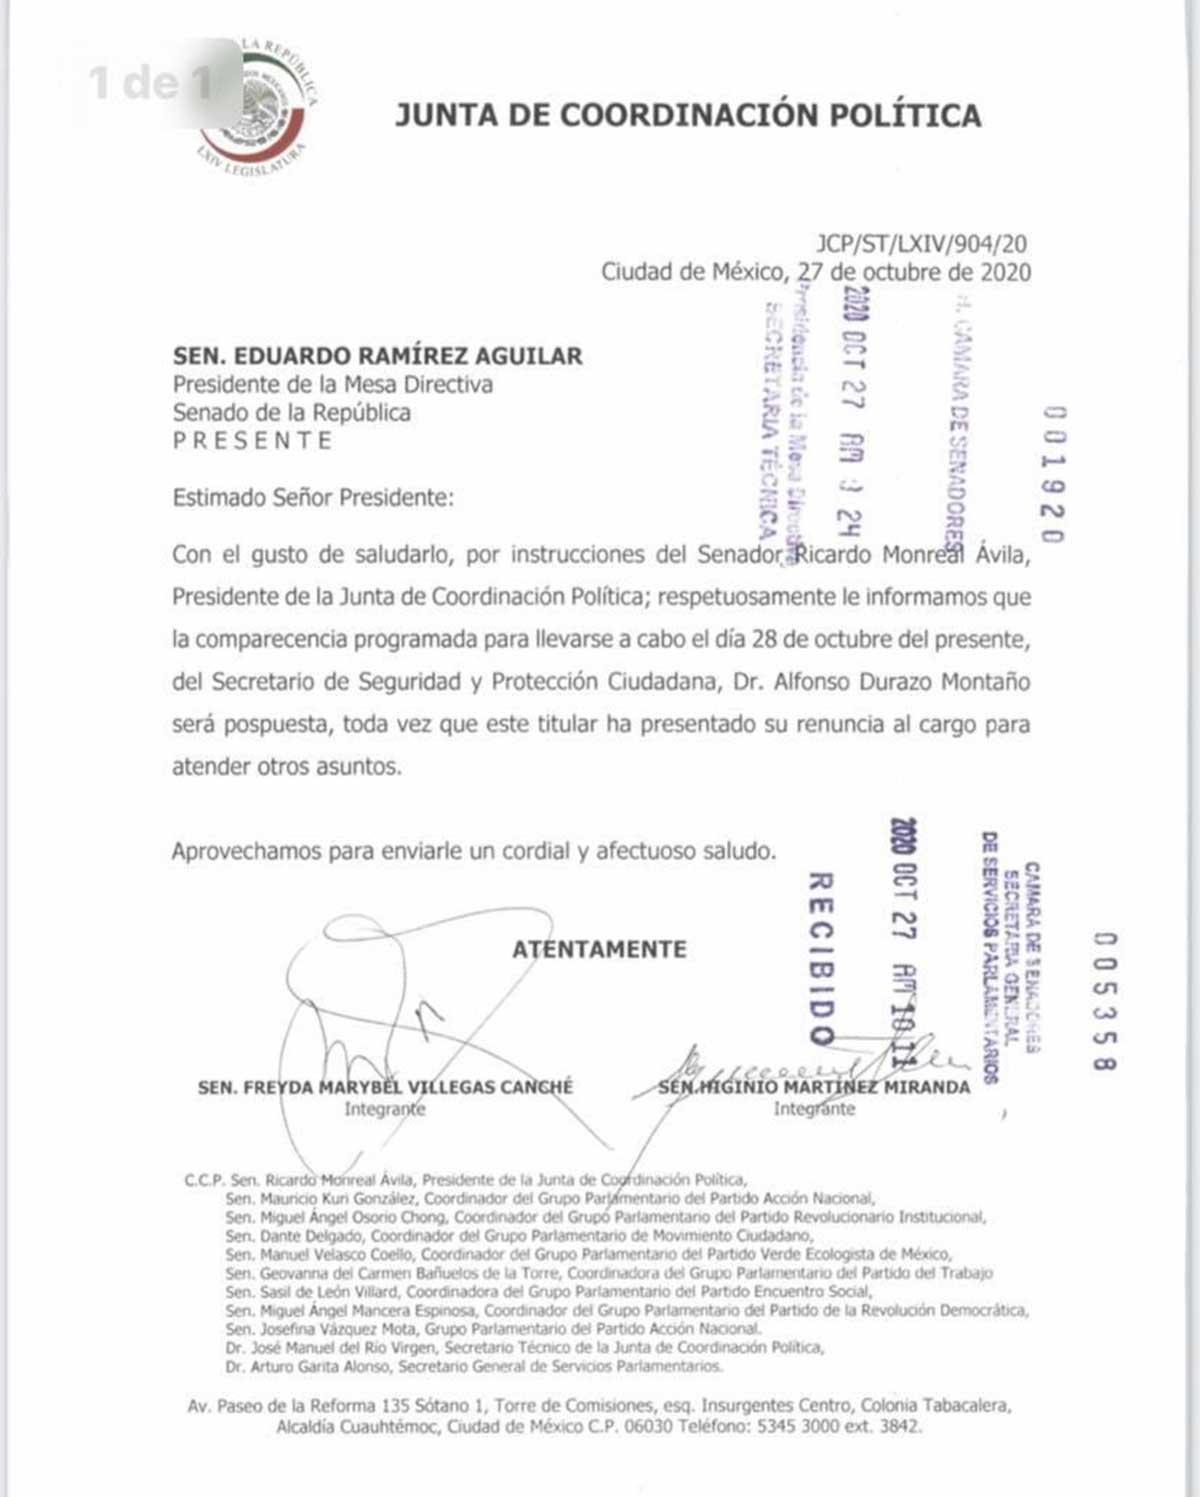 Boletín del Senado sobre Alfonso Durazo